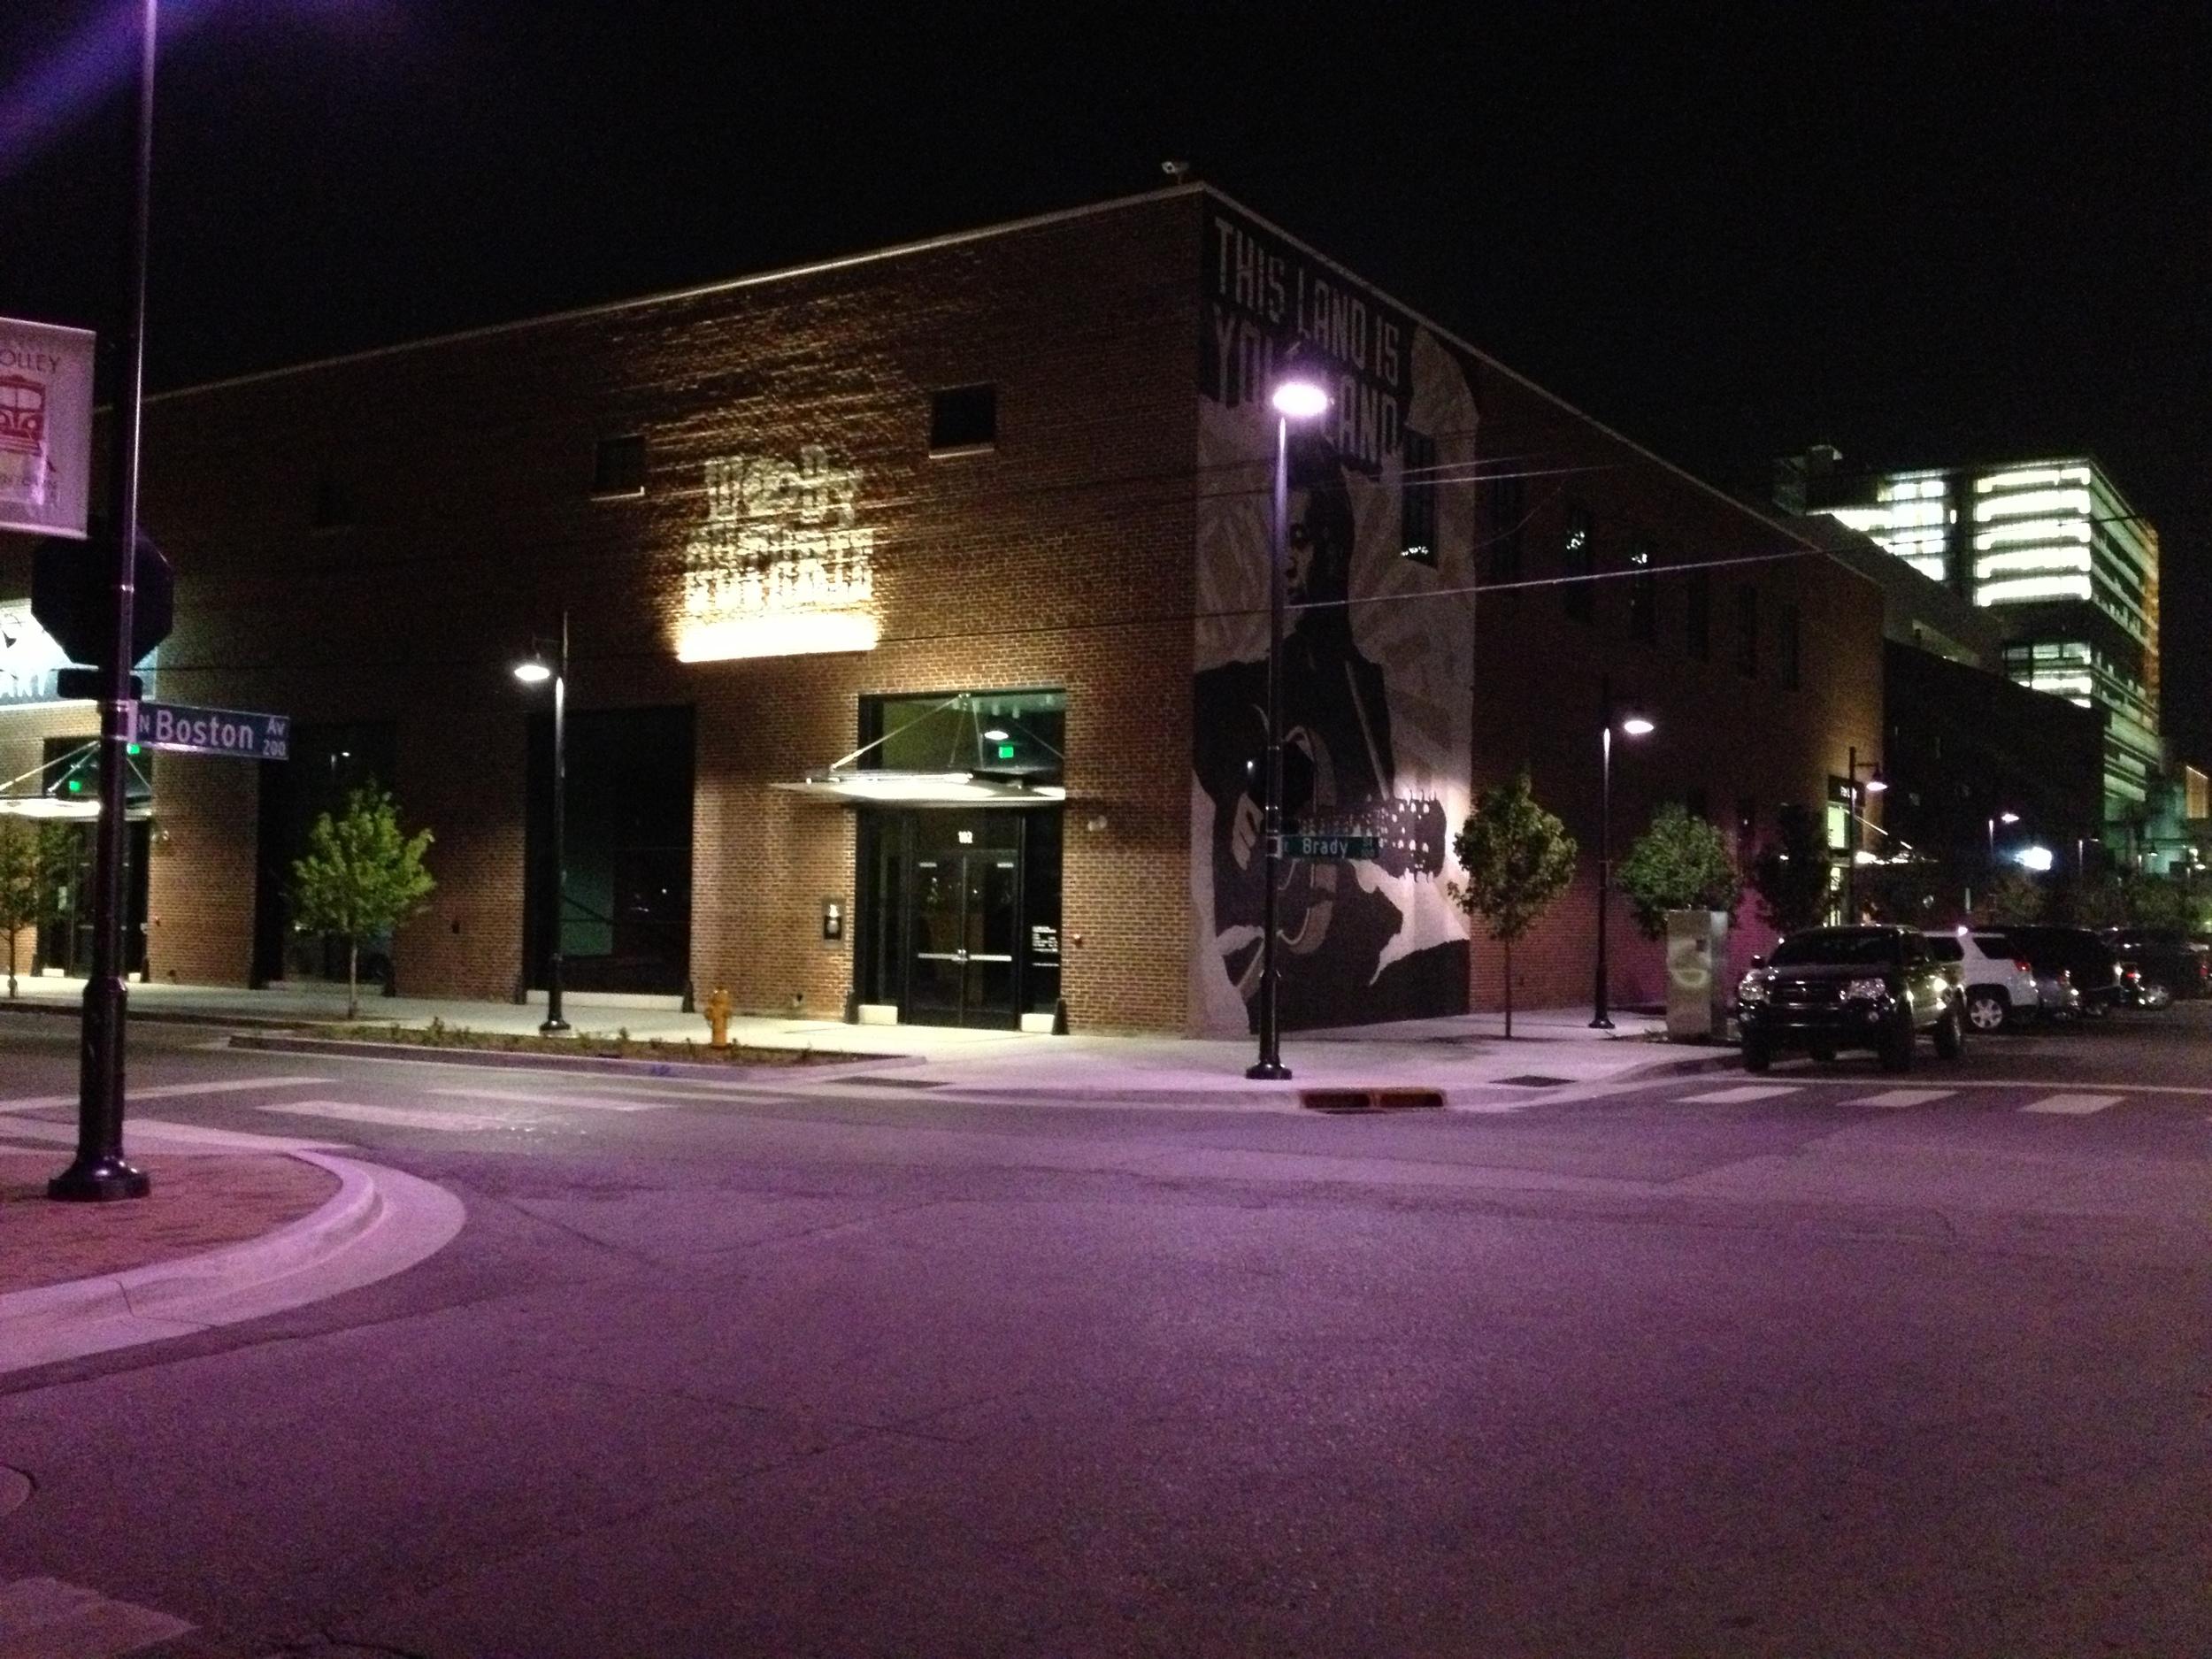 Woody tGutrhie Art in Downtown Tulsa